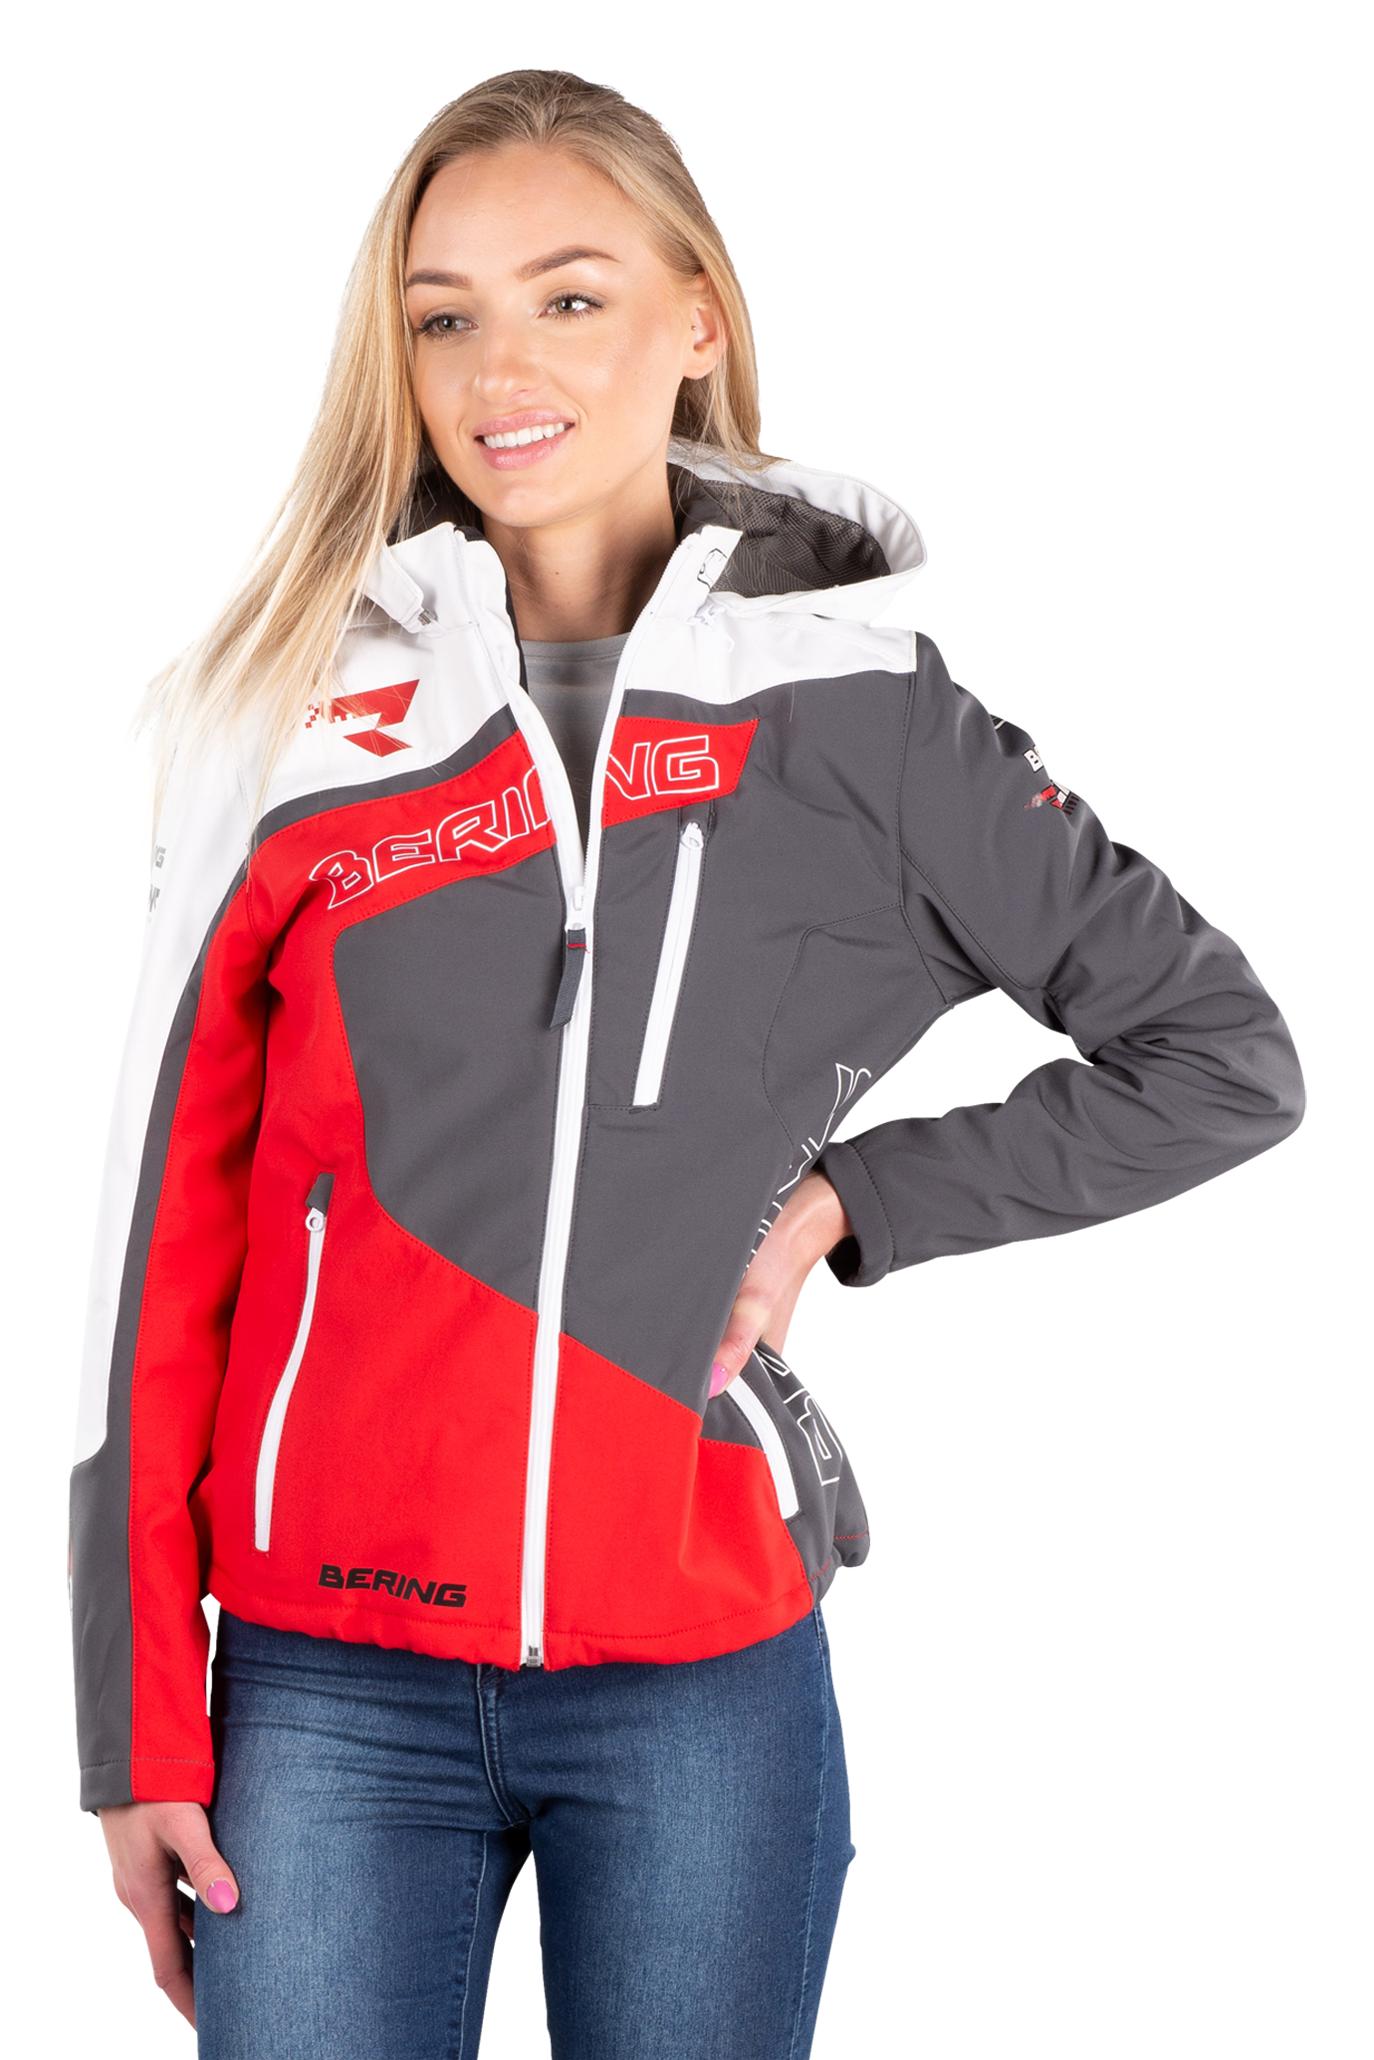 bering giacca moto donna  softshell racing bianco-rosso-nero